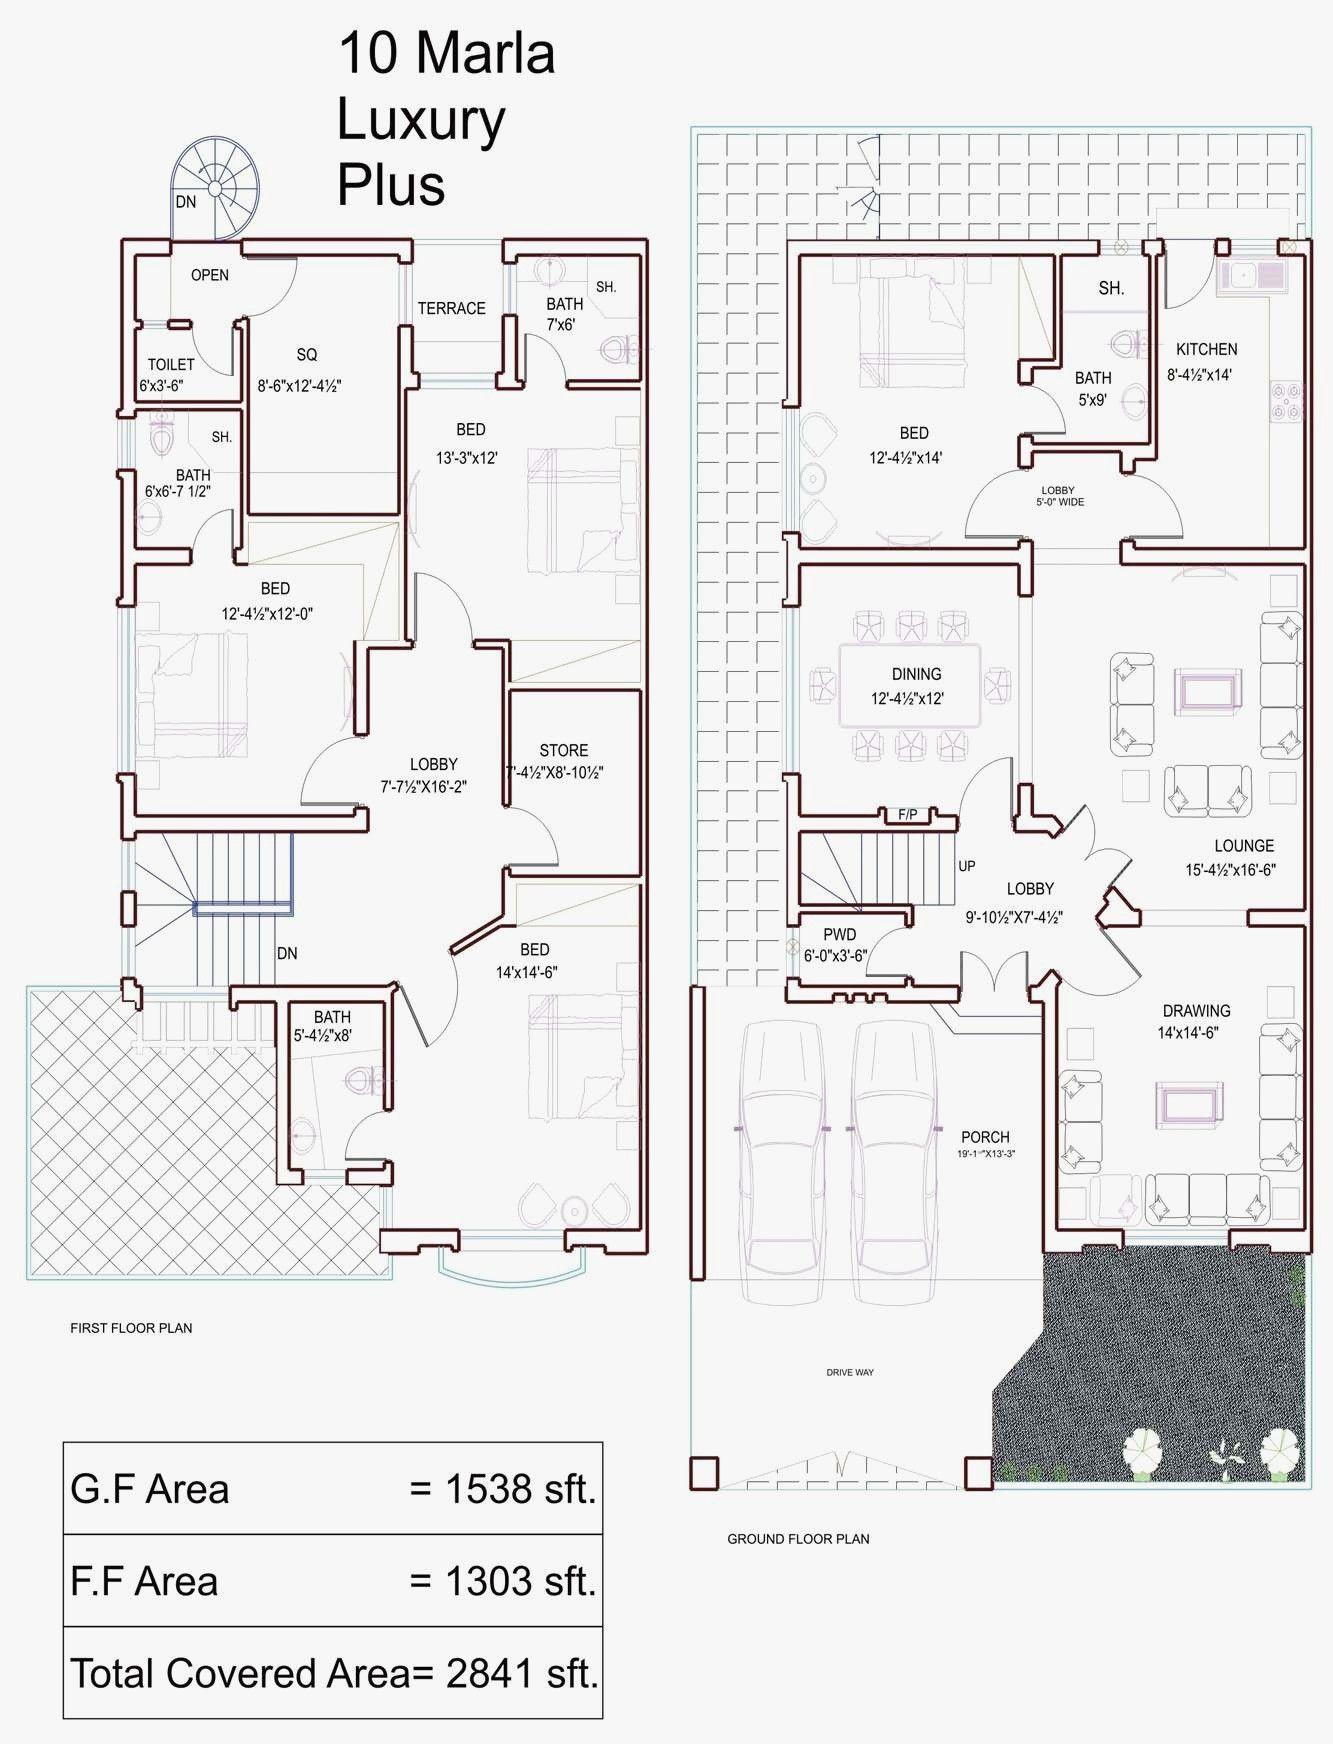 10 Marla House Design Best Of 10 Marla House Plans Civil Engineers Pk 10 Marla House Plan House Layout Plans My House Plans